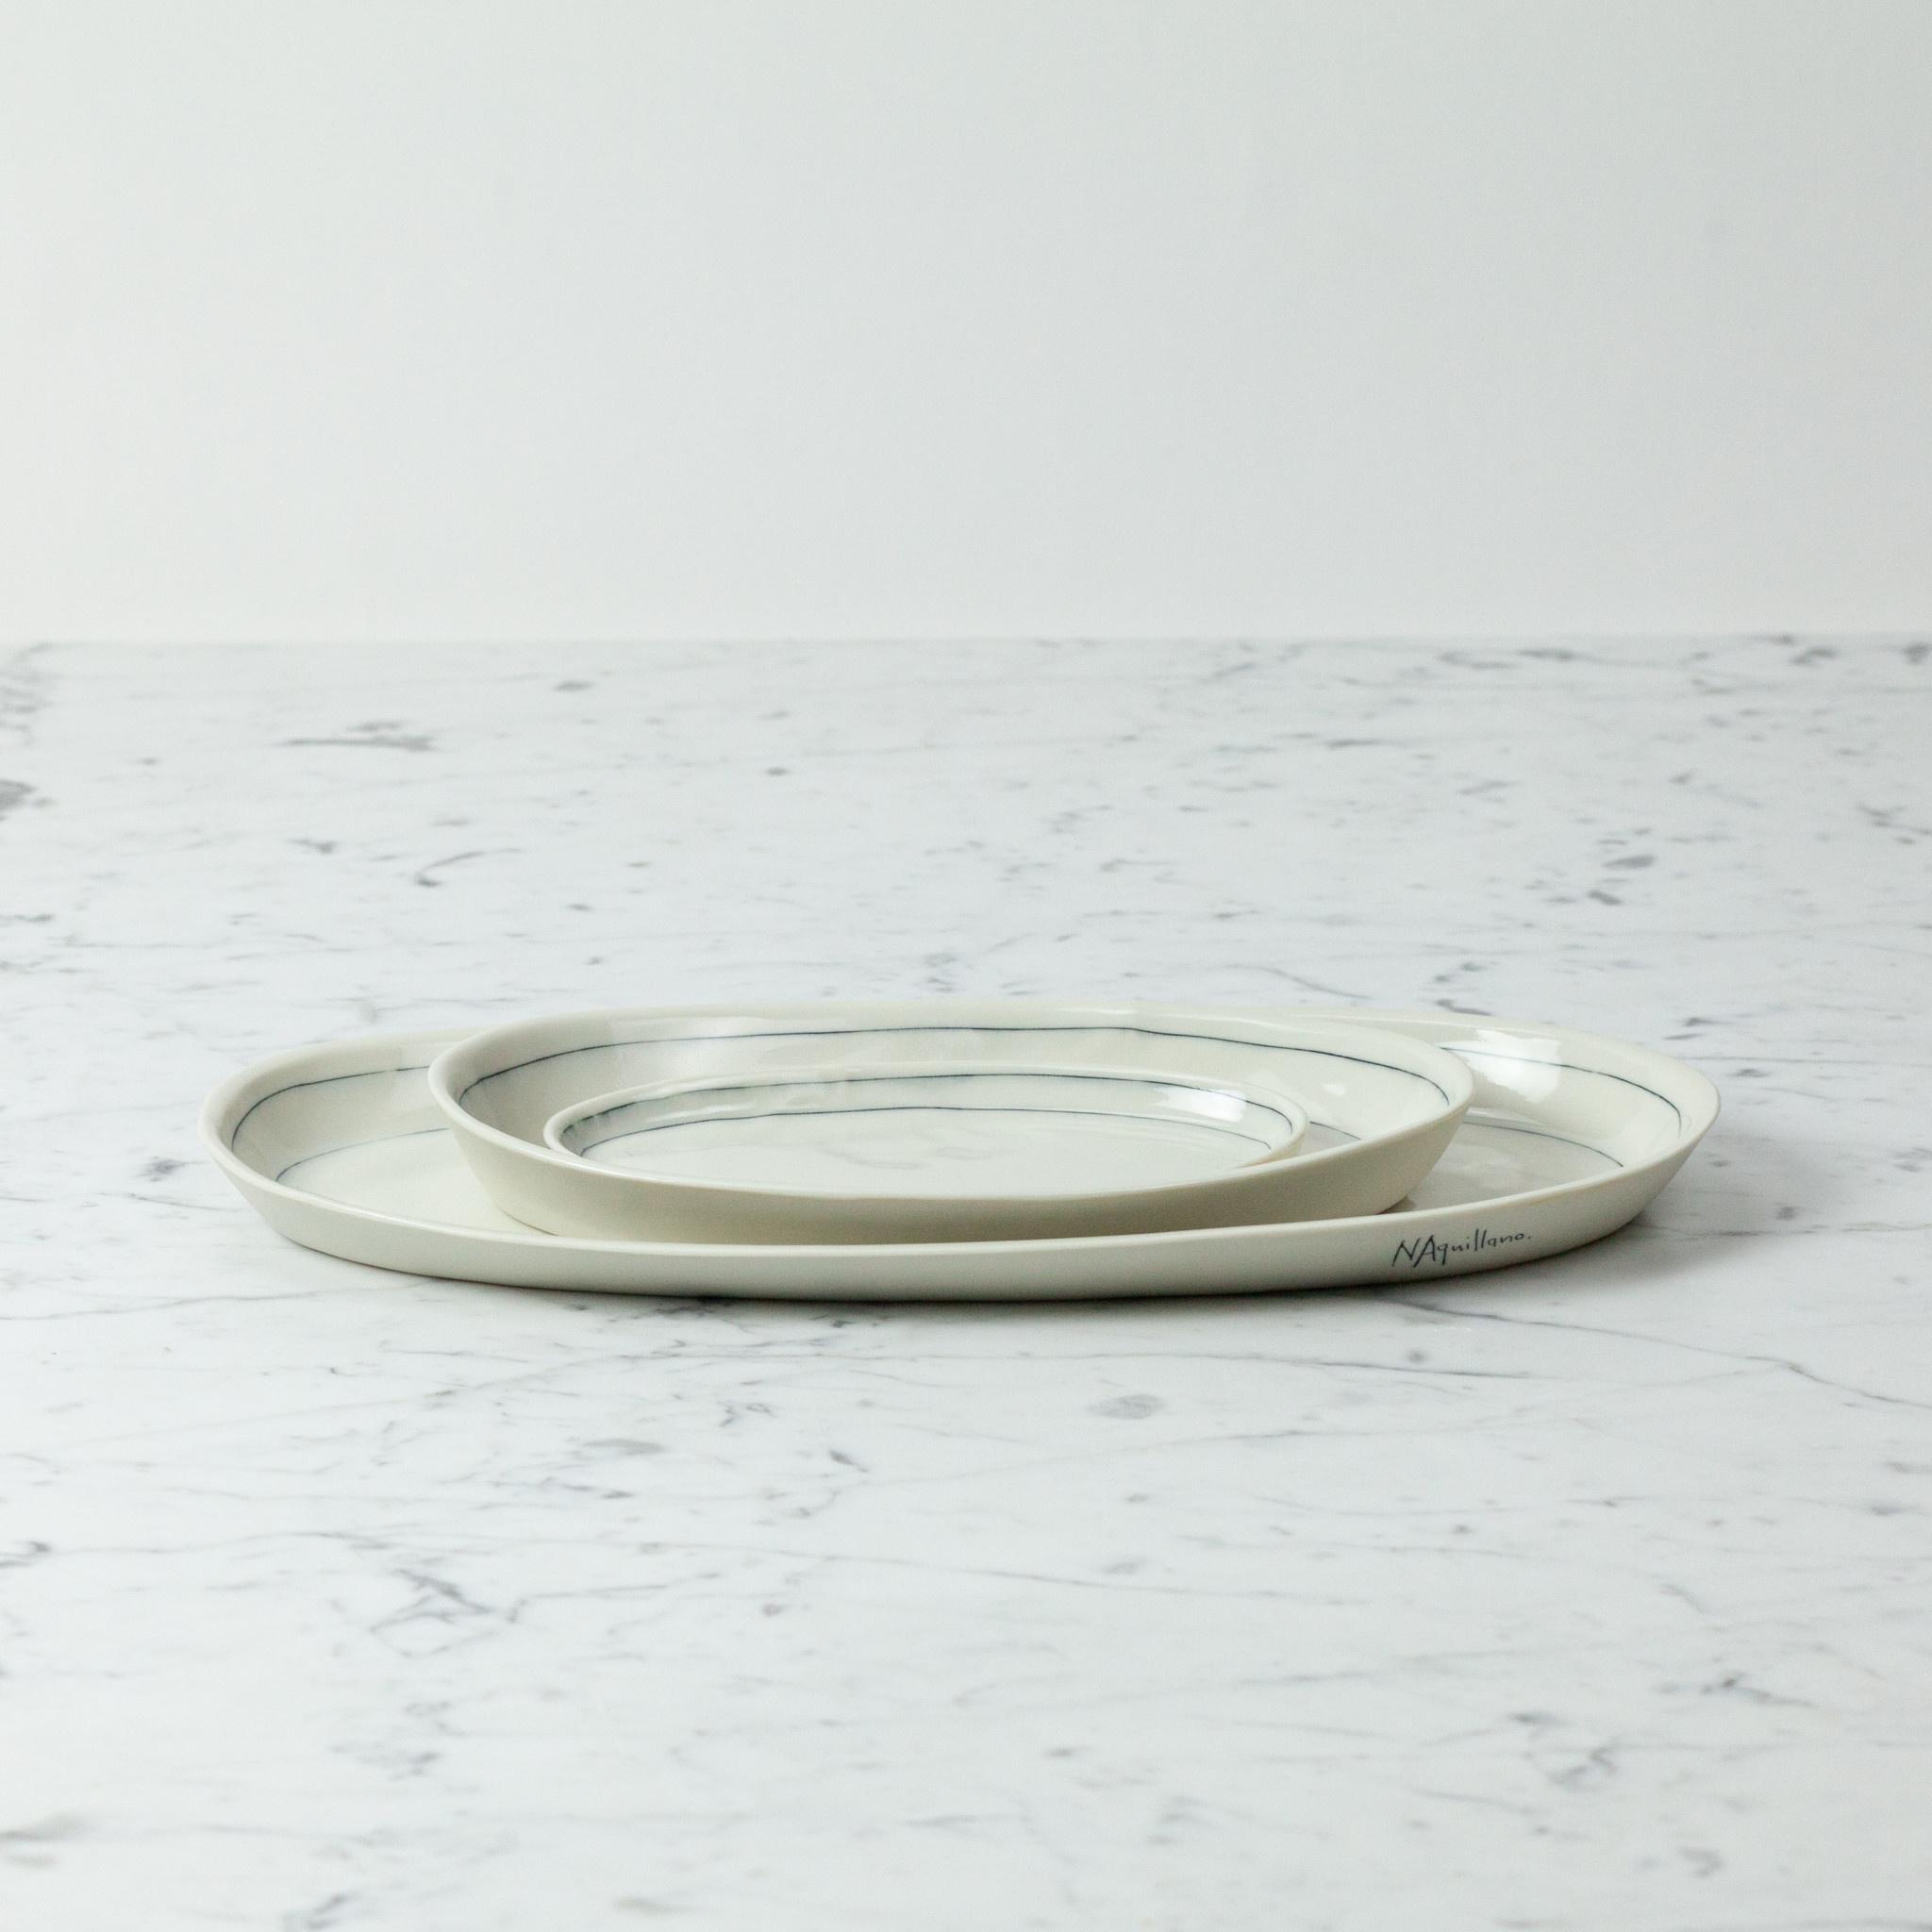 "Nicole Aquillano Nicole Aquillano Porcelain Simple Line Oval Serving Platter - Small - 6.75"""